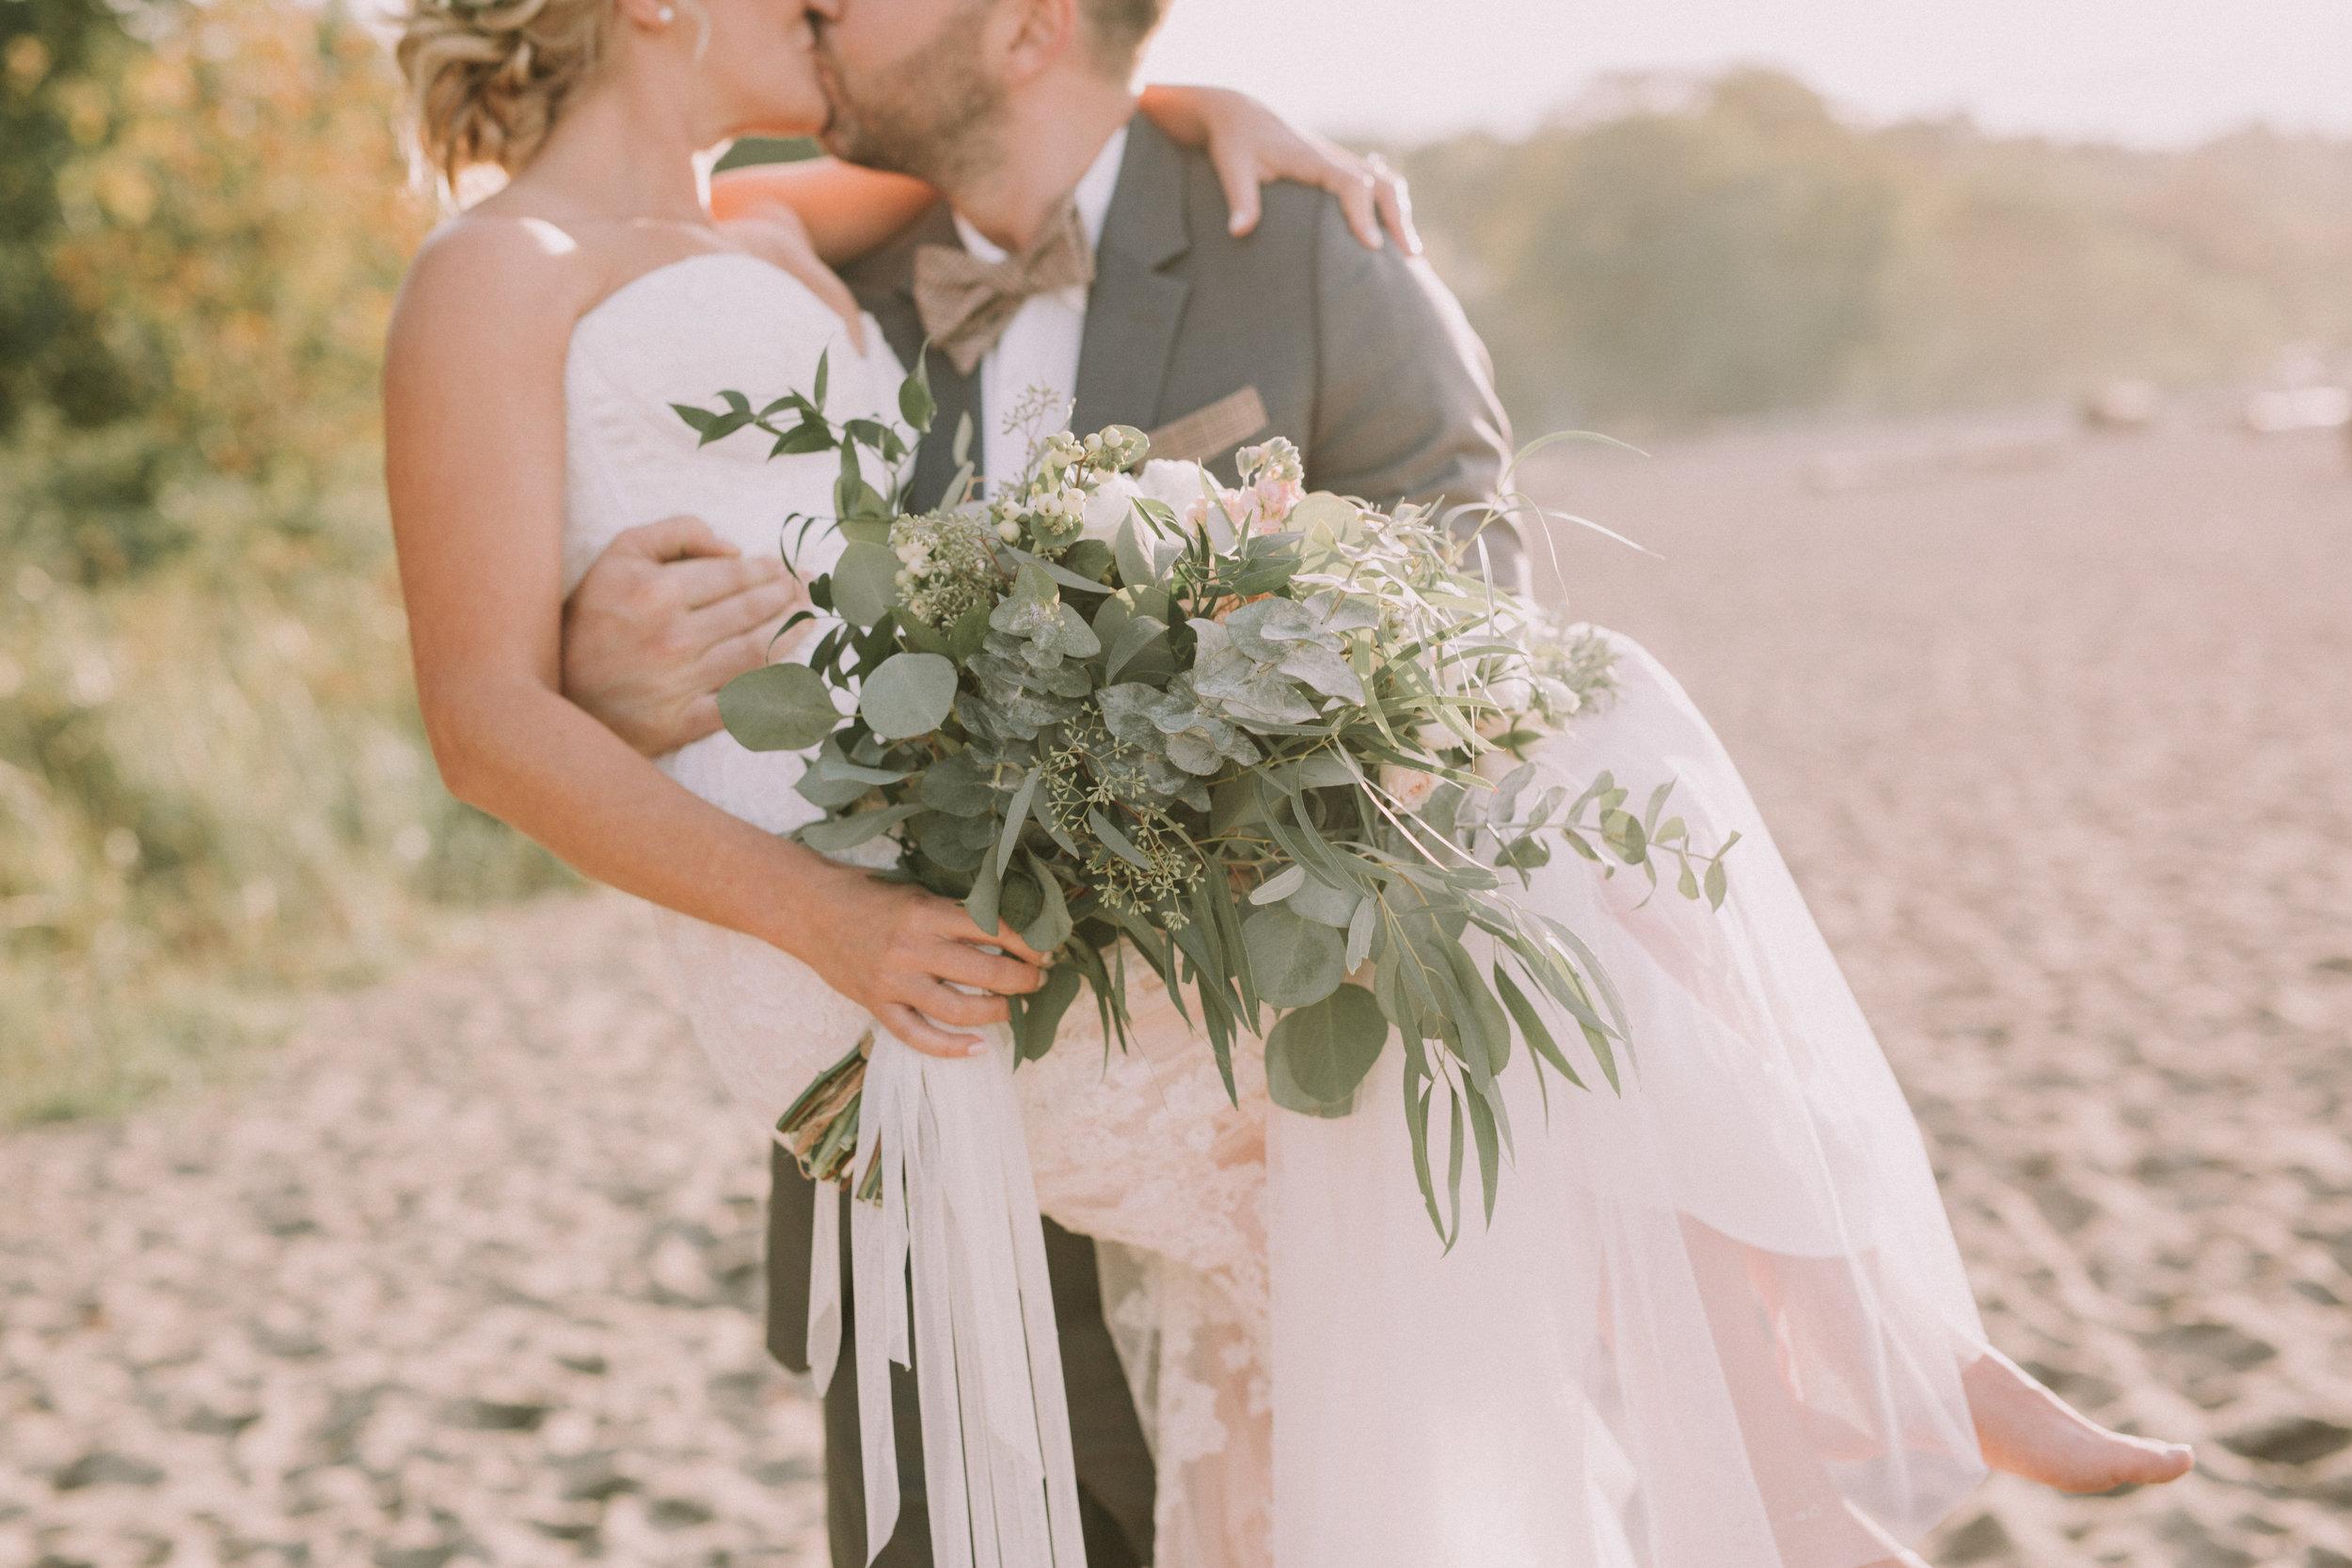 Vancouver Wedding Photographer, Brockhouse Wedding, Jennifer Picard Photography